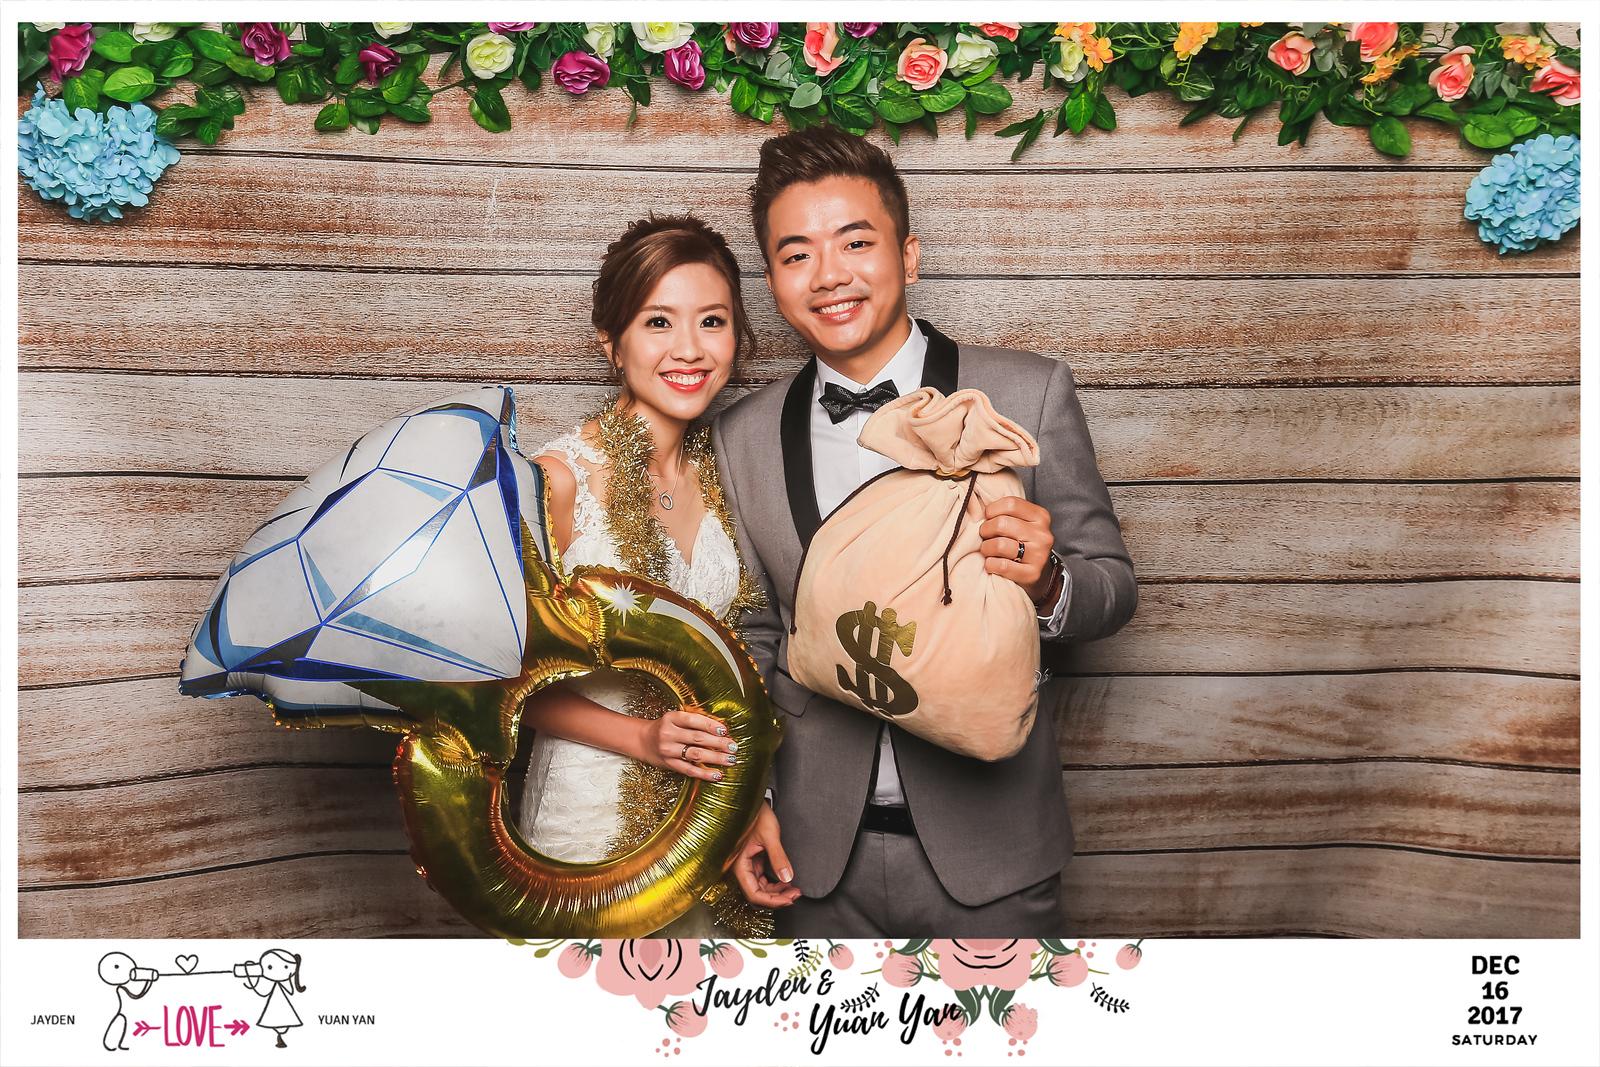 Wedding of Jayden & Yuan Yan   © www.SRSLYPhotobooth.sg